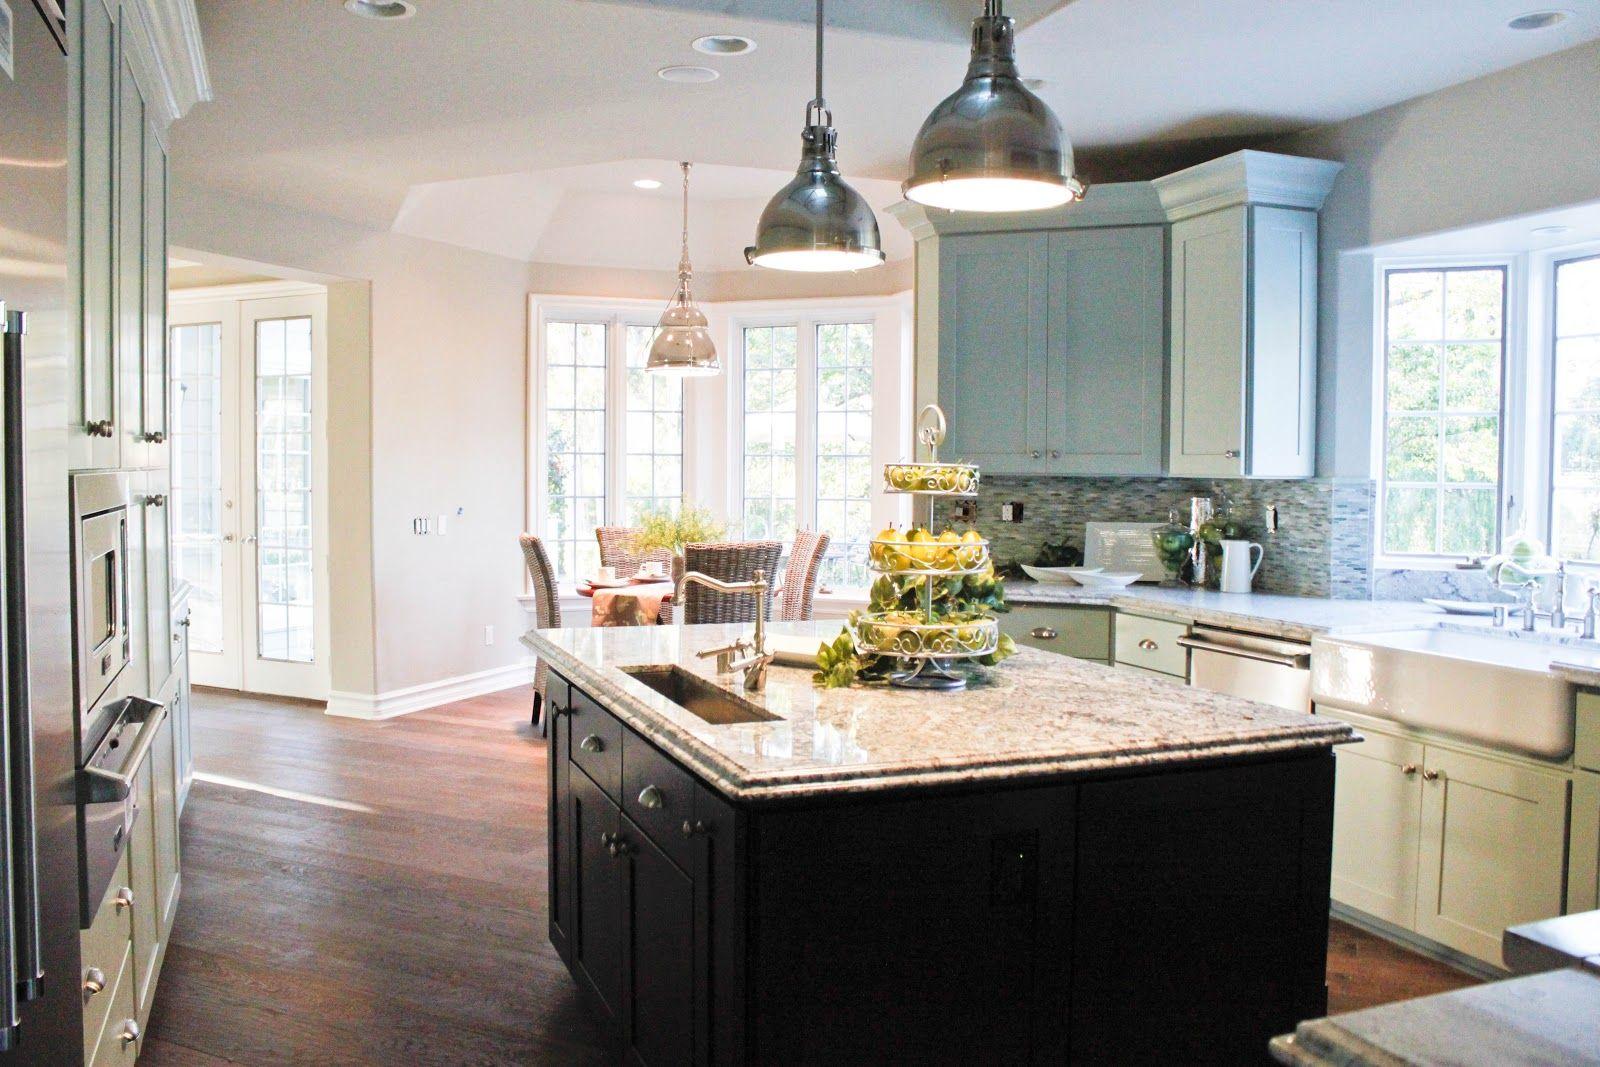 modern black kitchen island breakfast bar integrated fridge